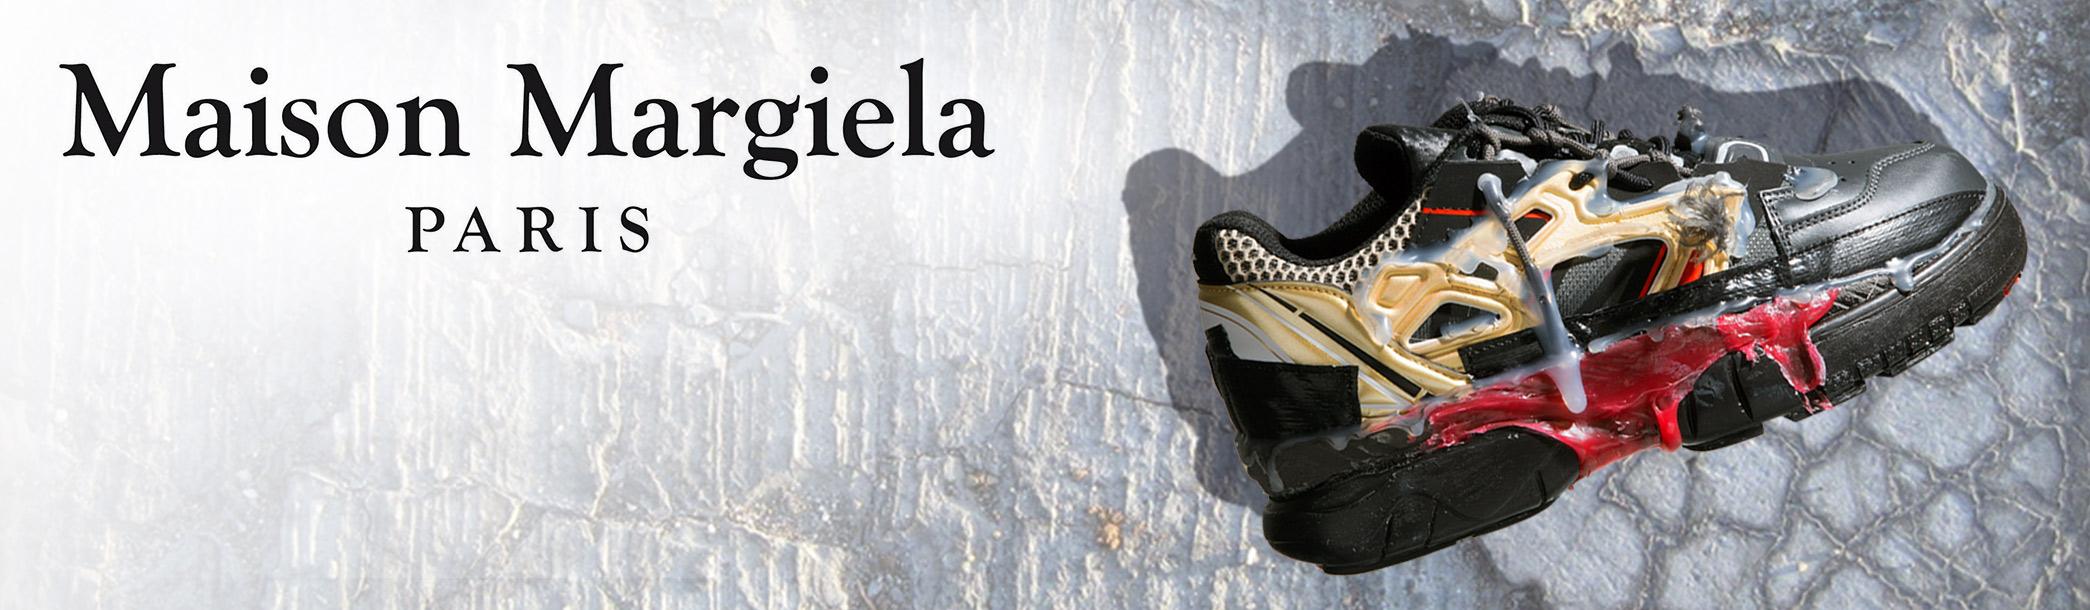 Fabulous fashionable fusion footwear